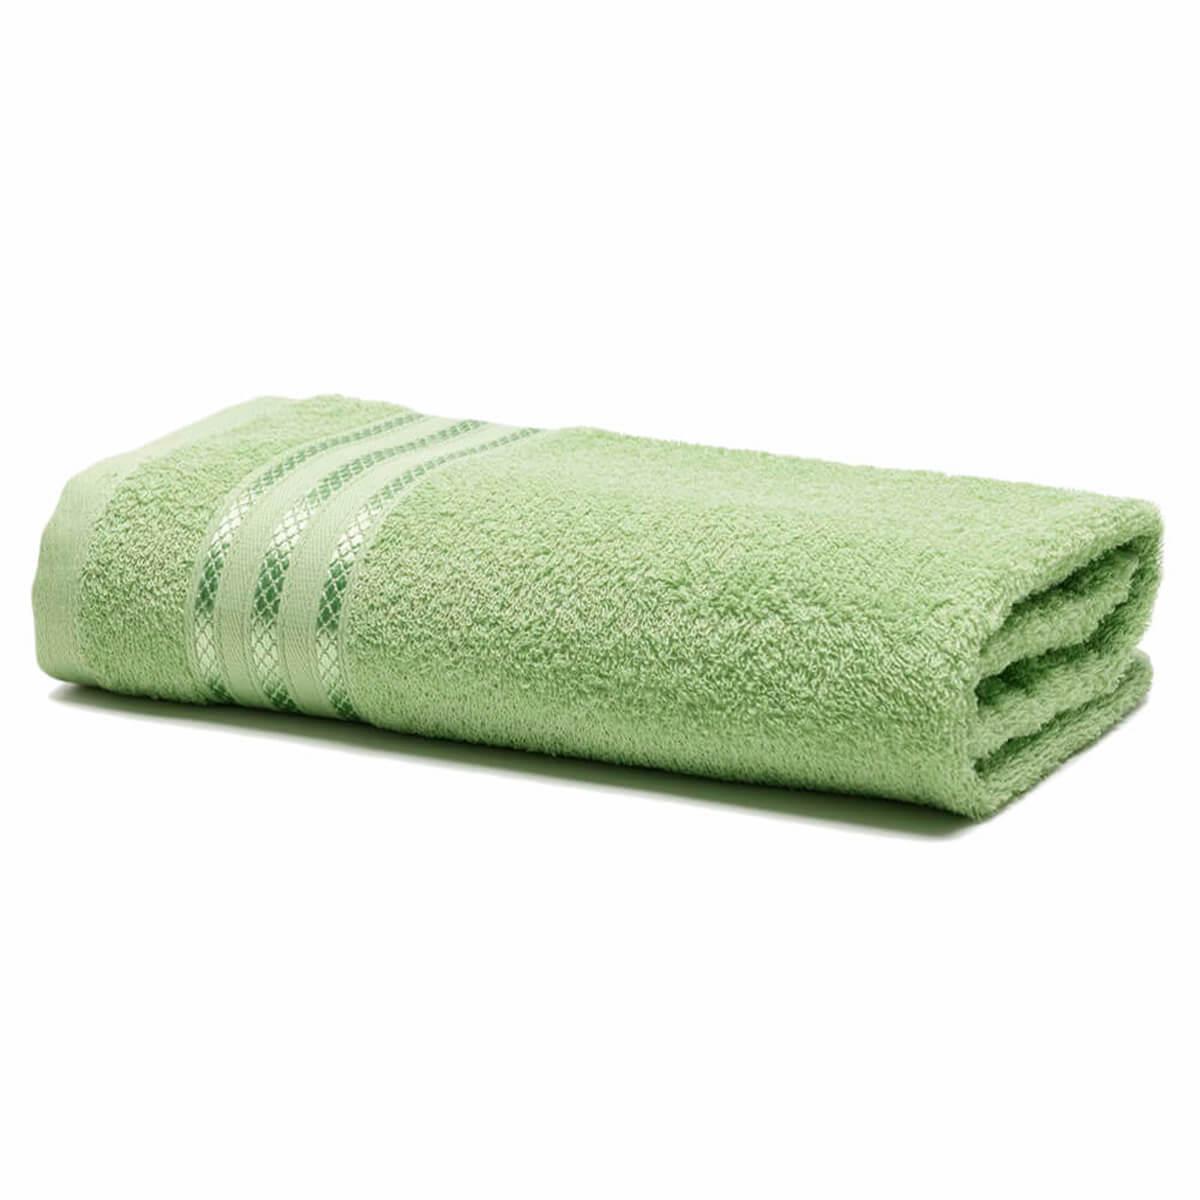 Toalha de Banho Felpuda Royal Patter Verde